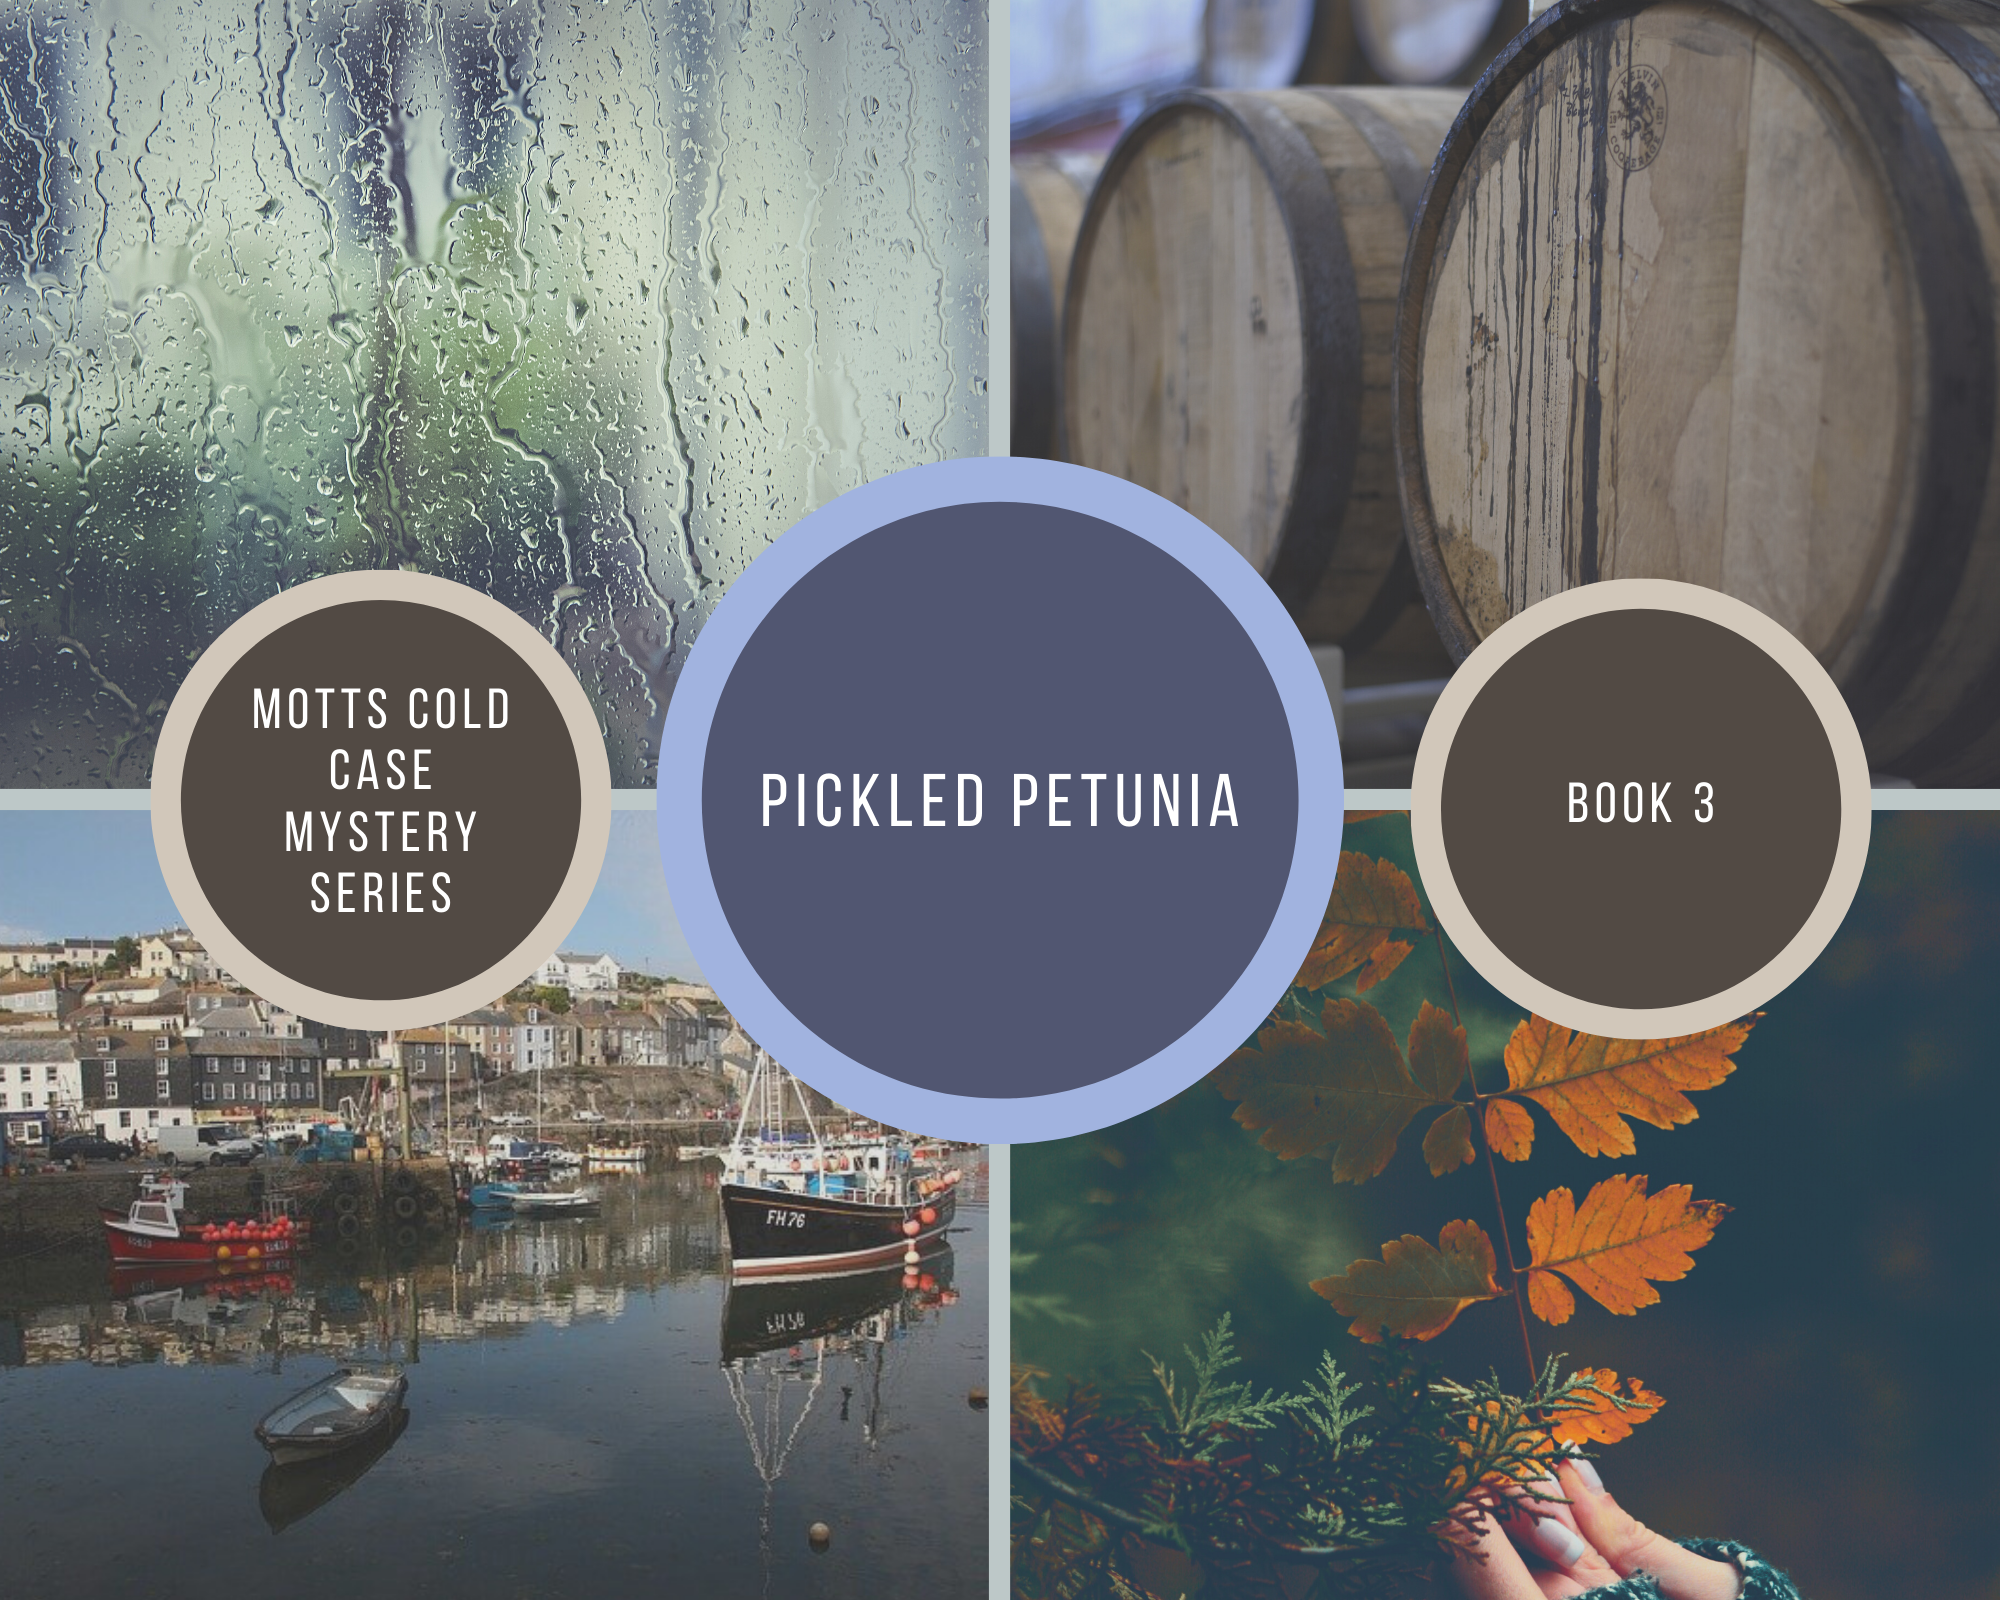 Pickled Petunia